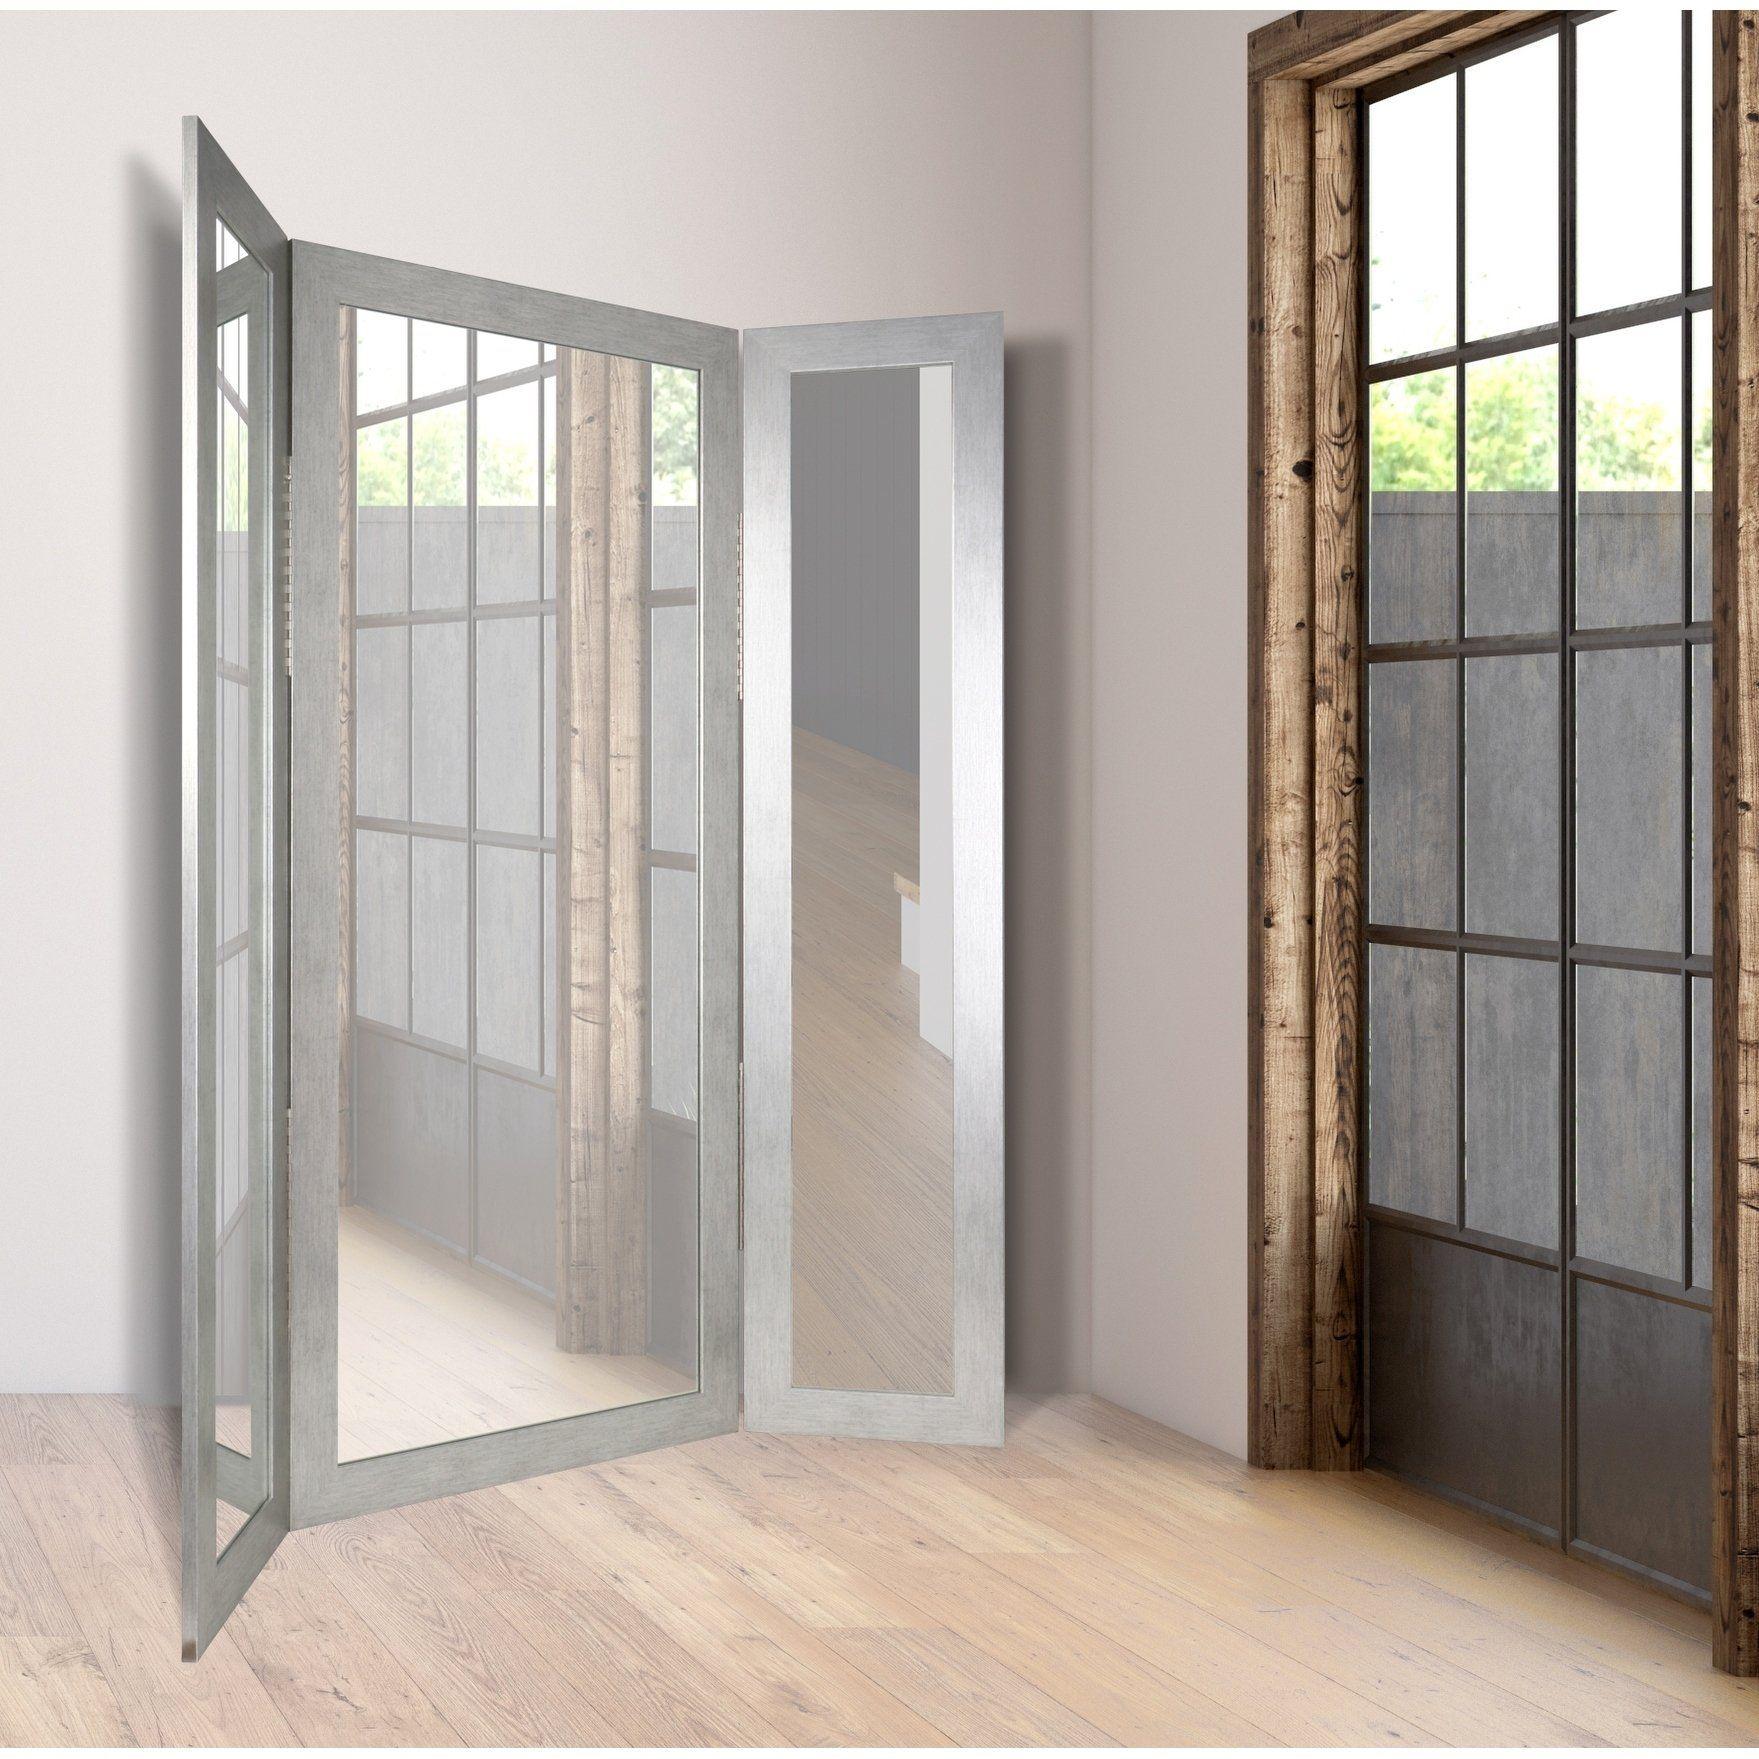 Silver Grain Tri Fold Dressing Mirror Silver Grain 64 X 71 Dressing Mirror Modern Style Homes Full Length Mirror Wall